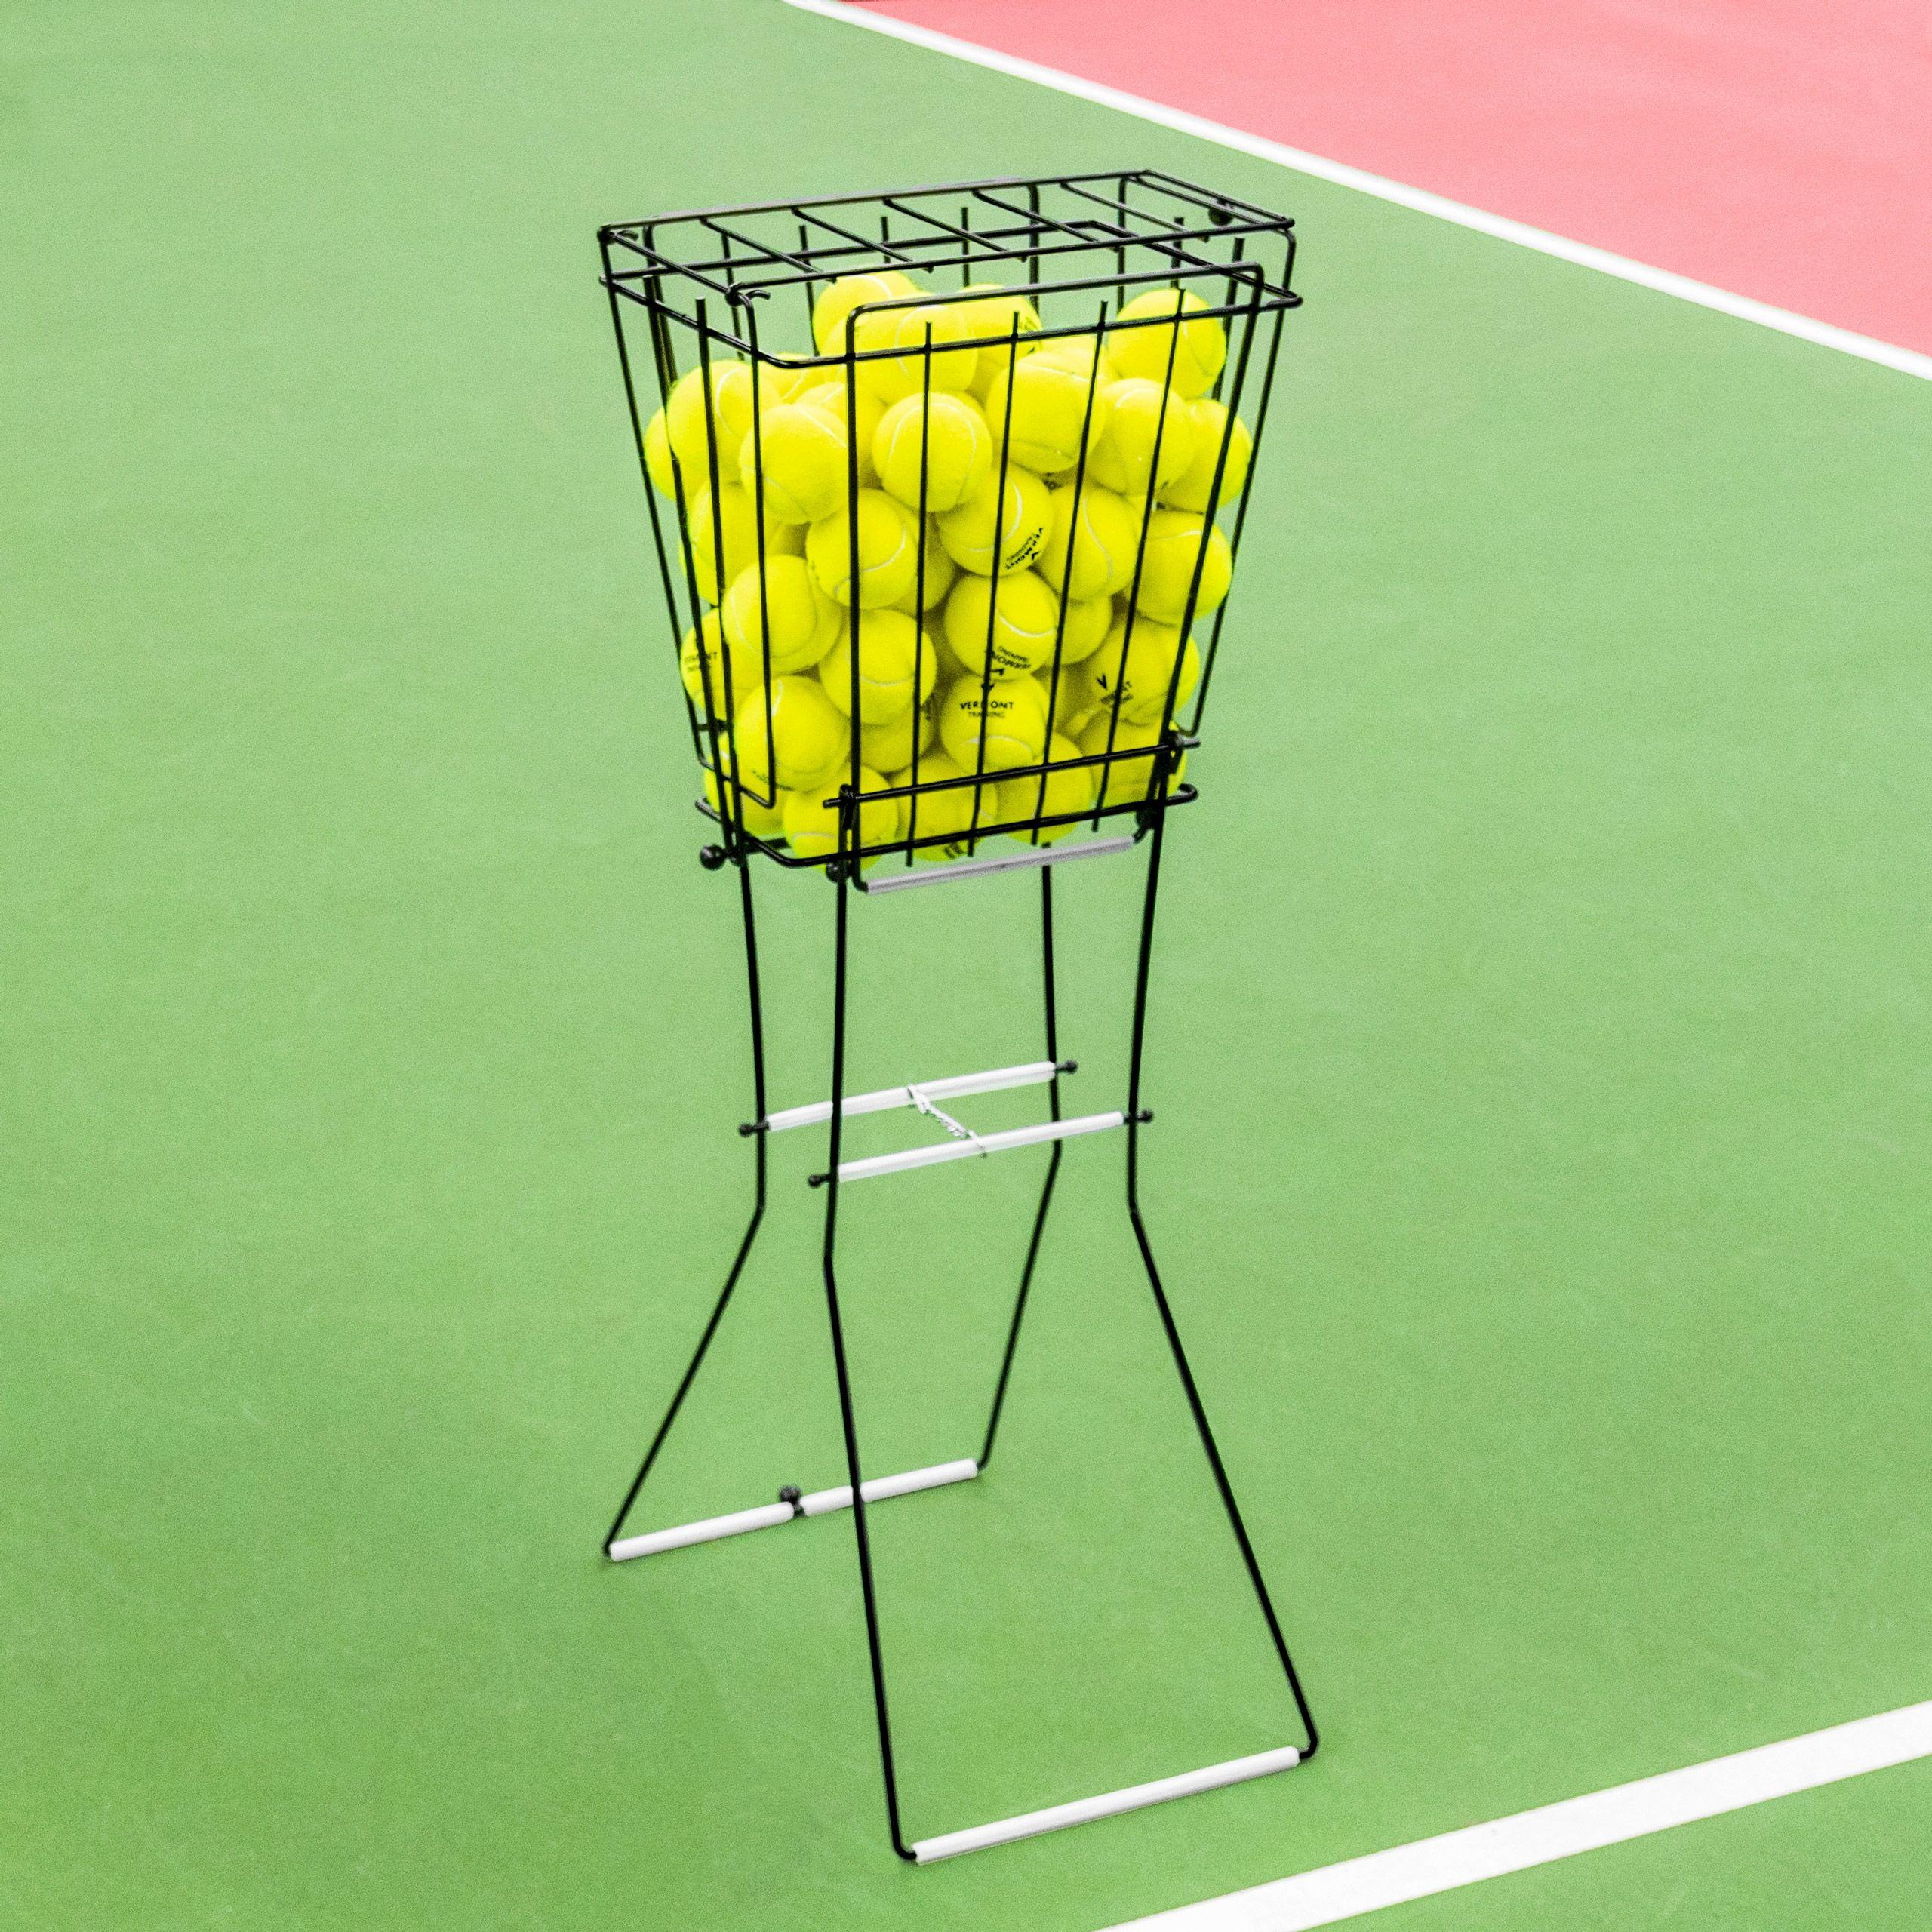 Professional Tennis Ball Basket Hopper Created Using Premium Powder Coated Steel Reversible Stand Simply Convert Tennis Ball Tennis Ball Crafts Tennis Balls